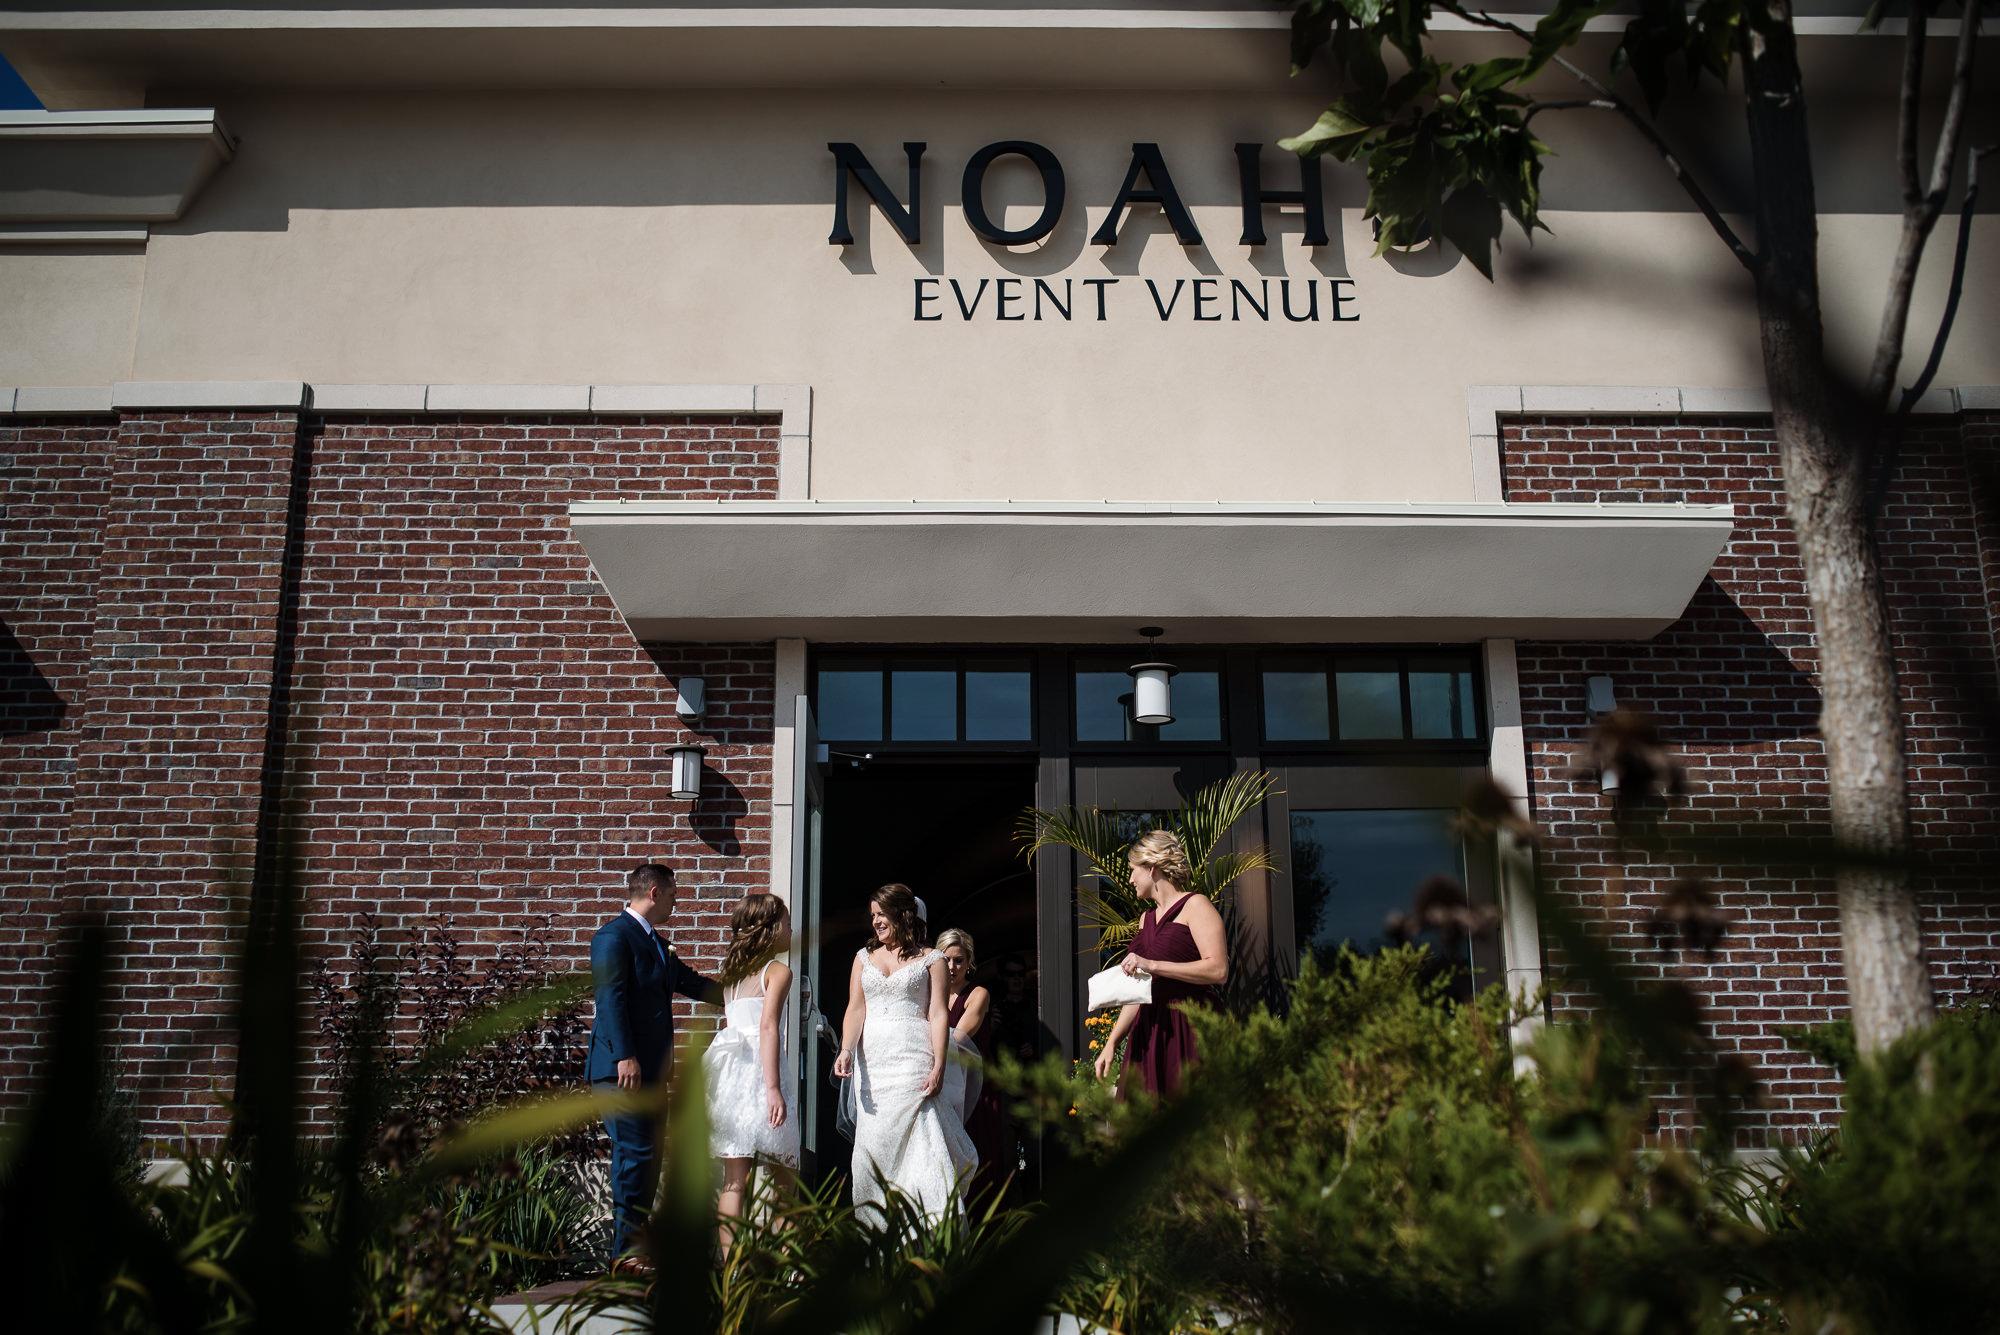 KEVIN-STACY-NOAHS-EVENT-VENUE-OMAHA-WEDDING-PHOTOGRAPHER-012.jpg